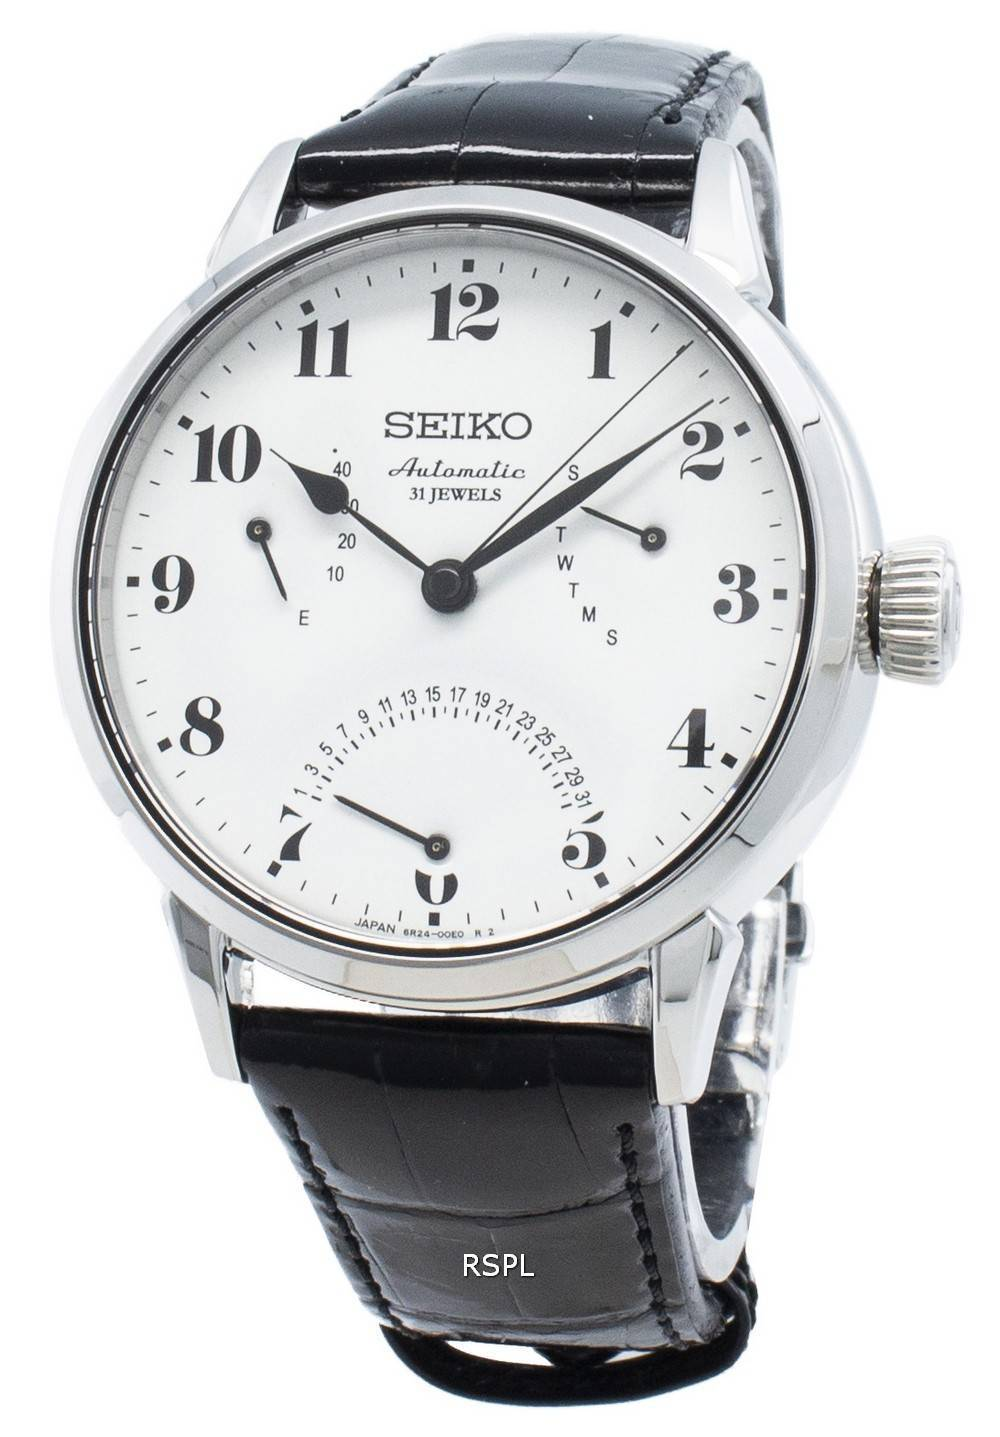 Seiko Presage Automaattinen virranvaraus SARD007 miesten kello